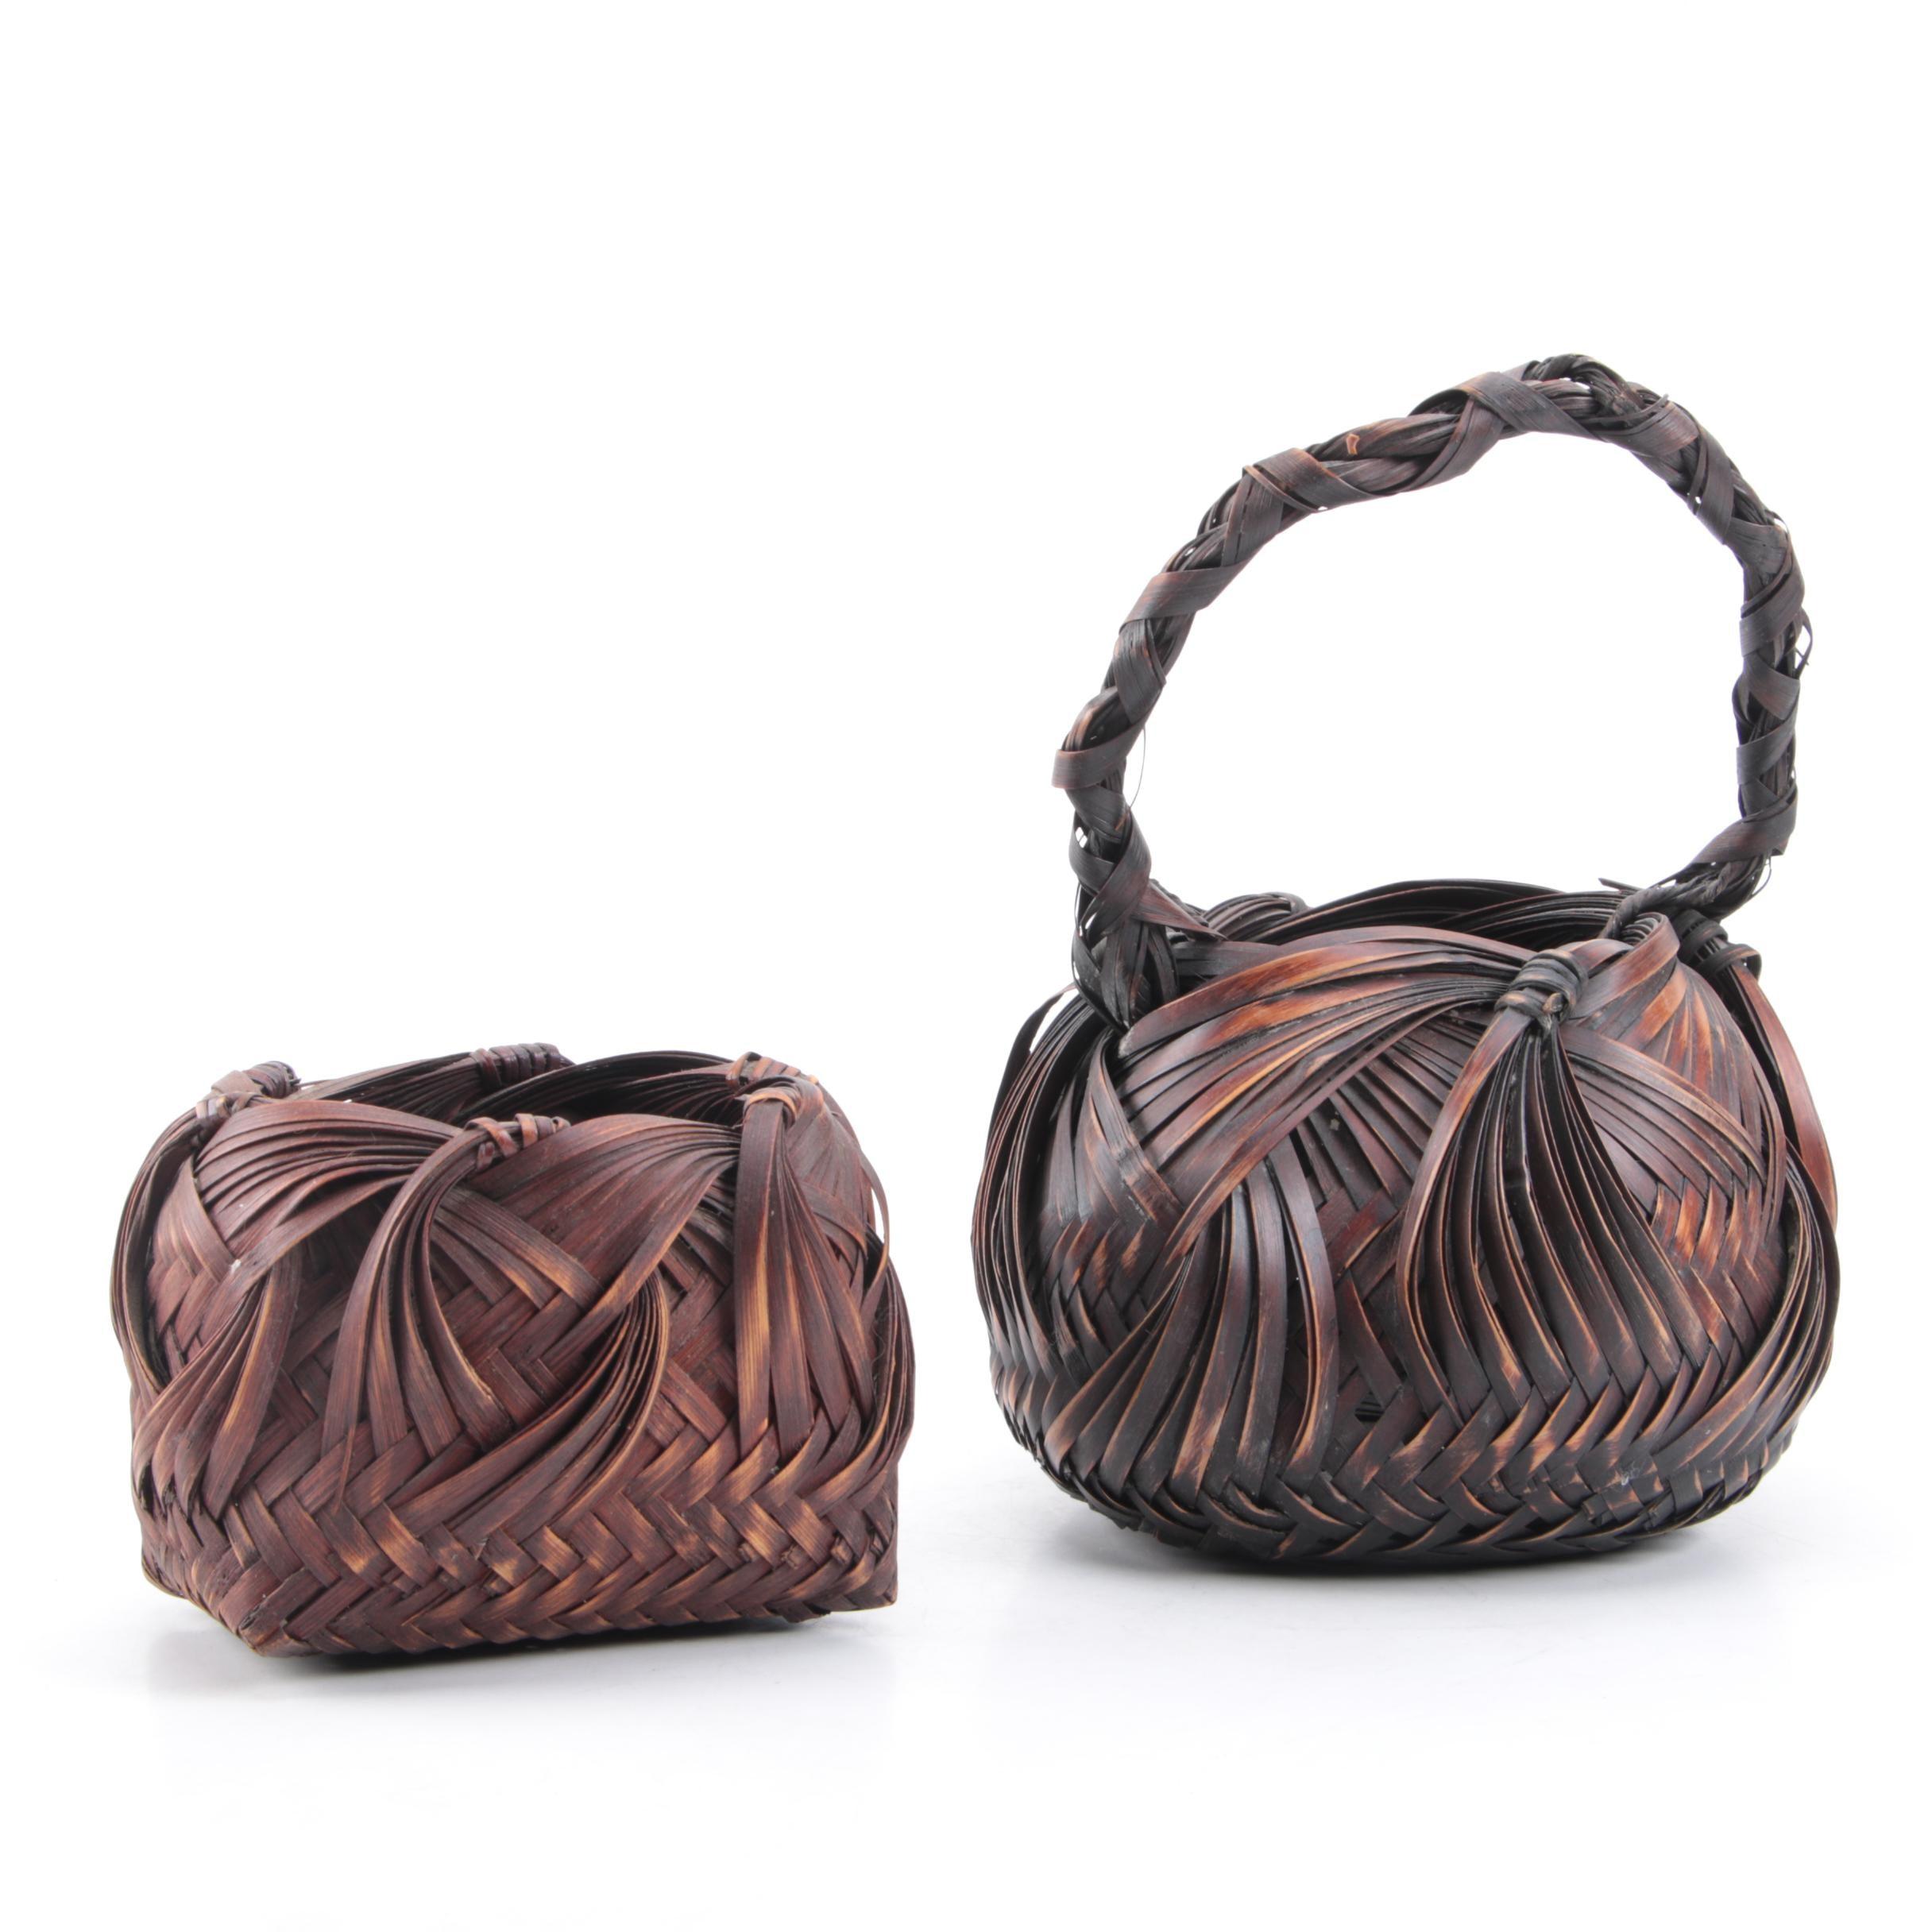 Japanese Ikebana Baskets